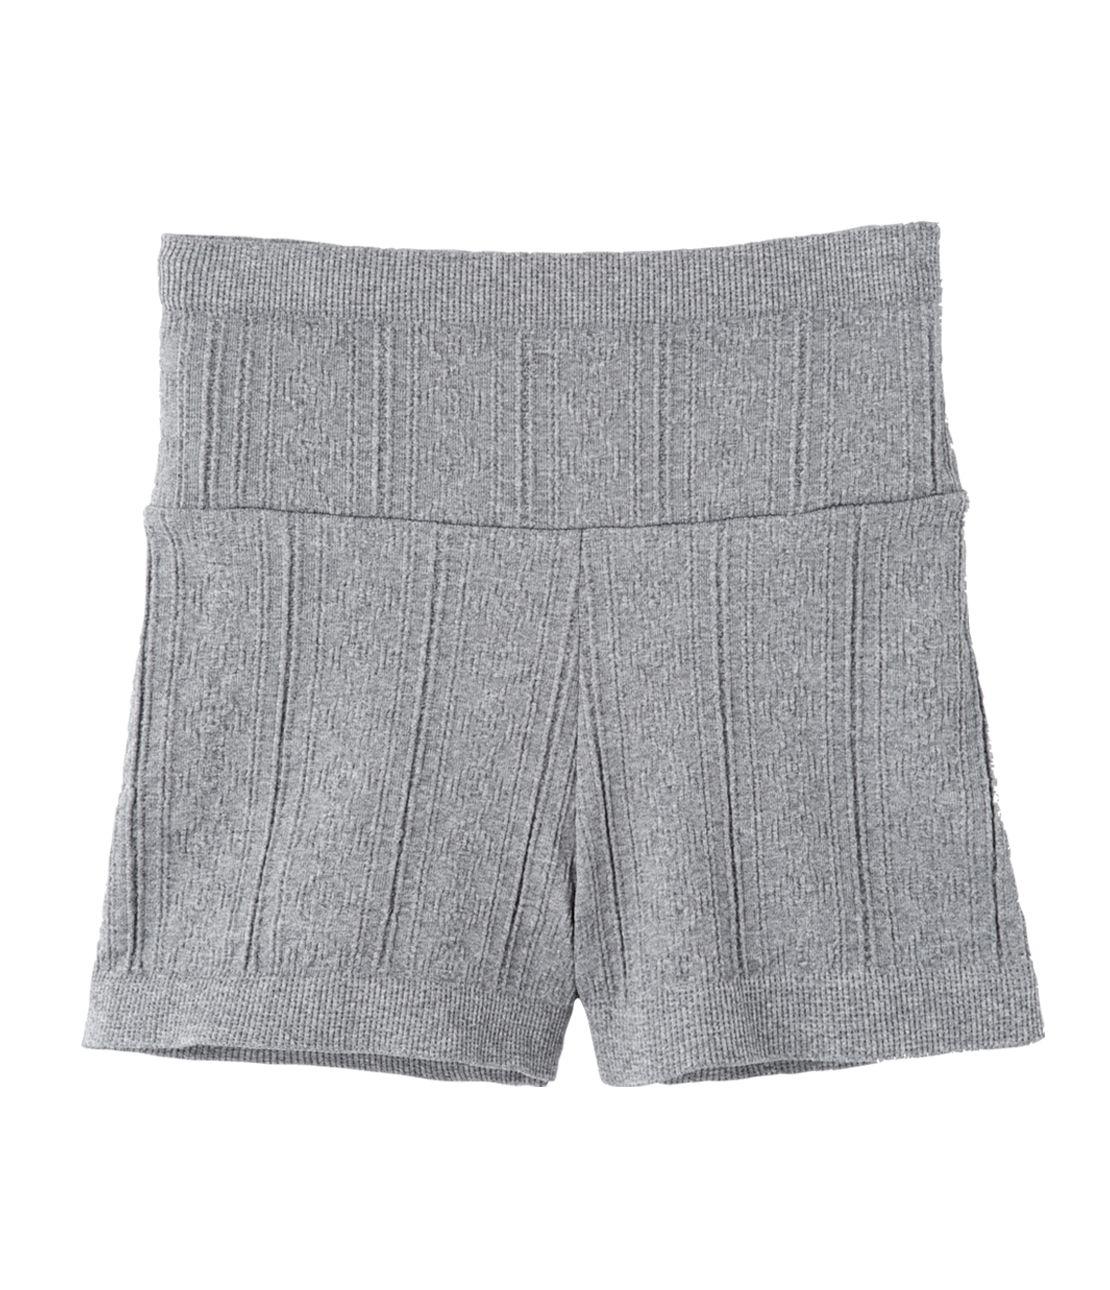 PJ COLORS電纜HARA希在褲子